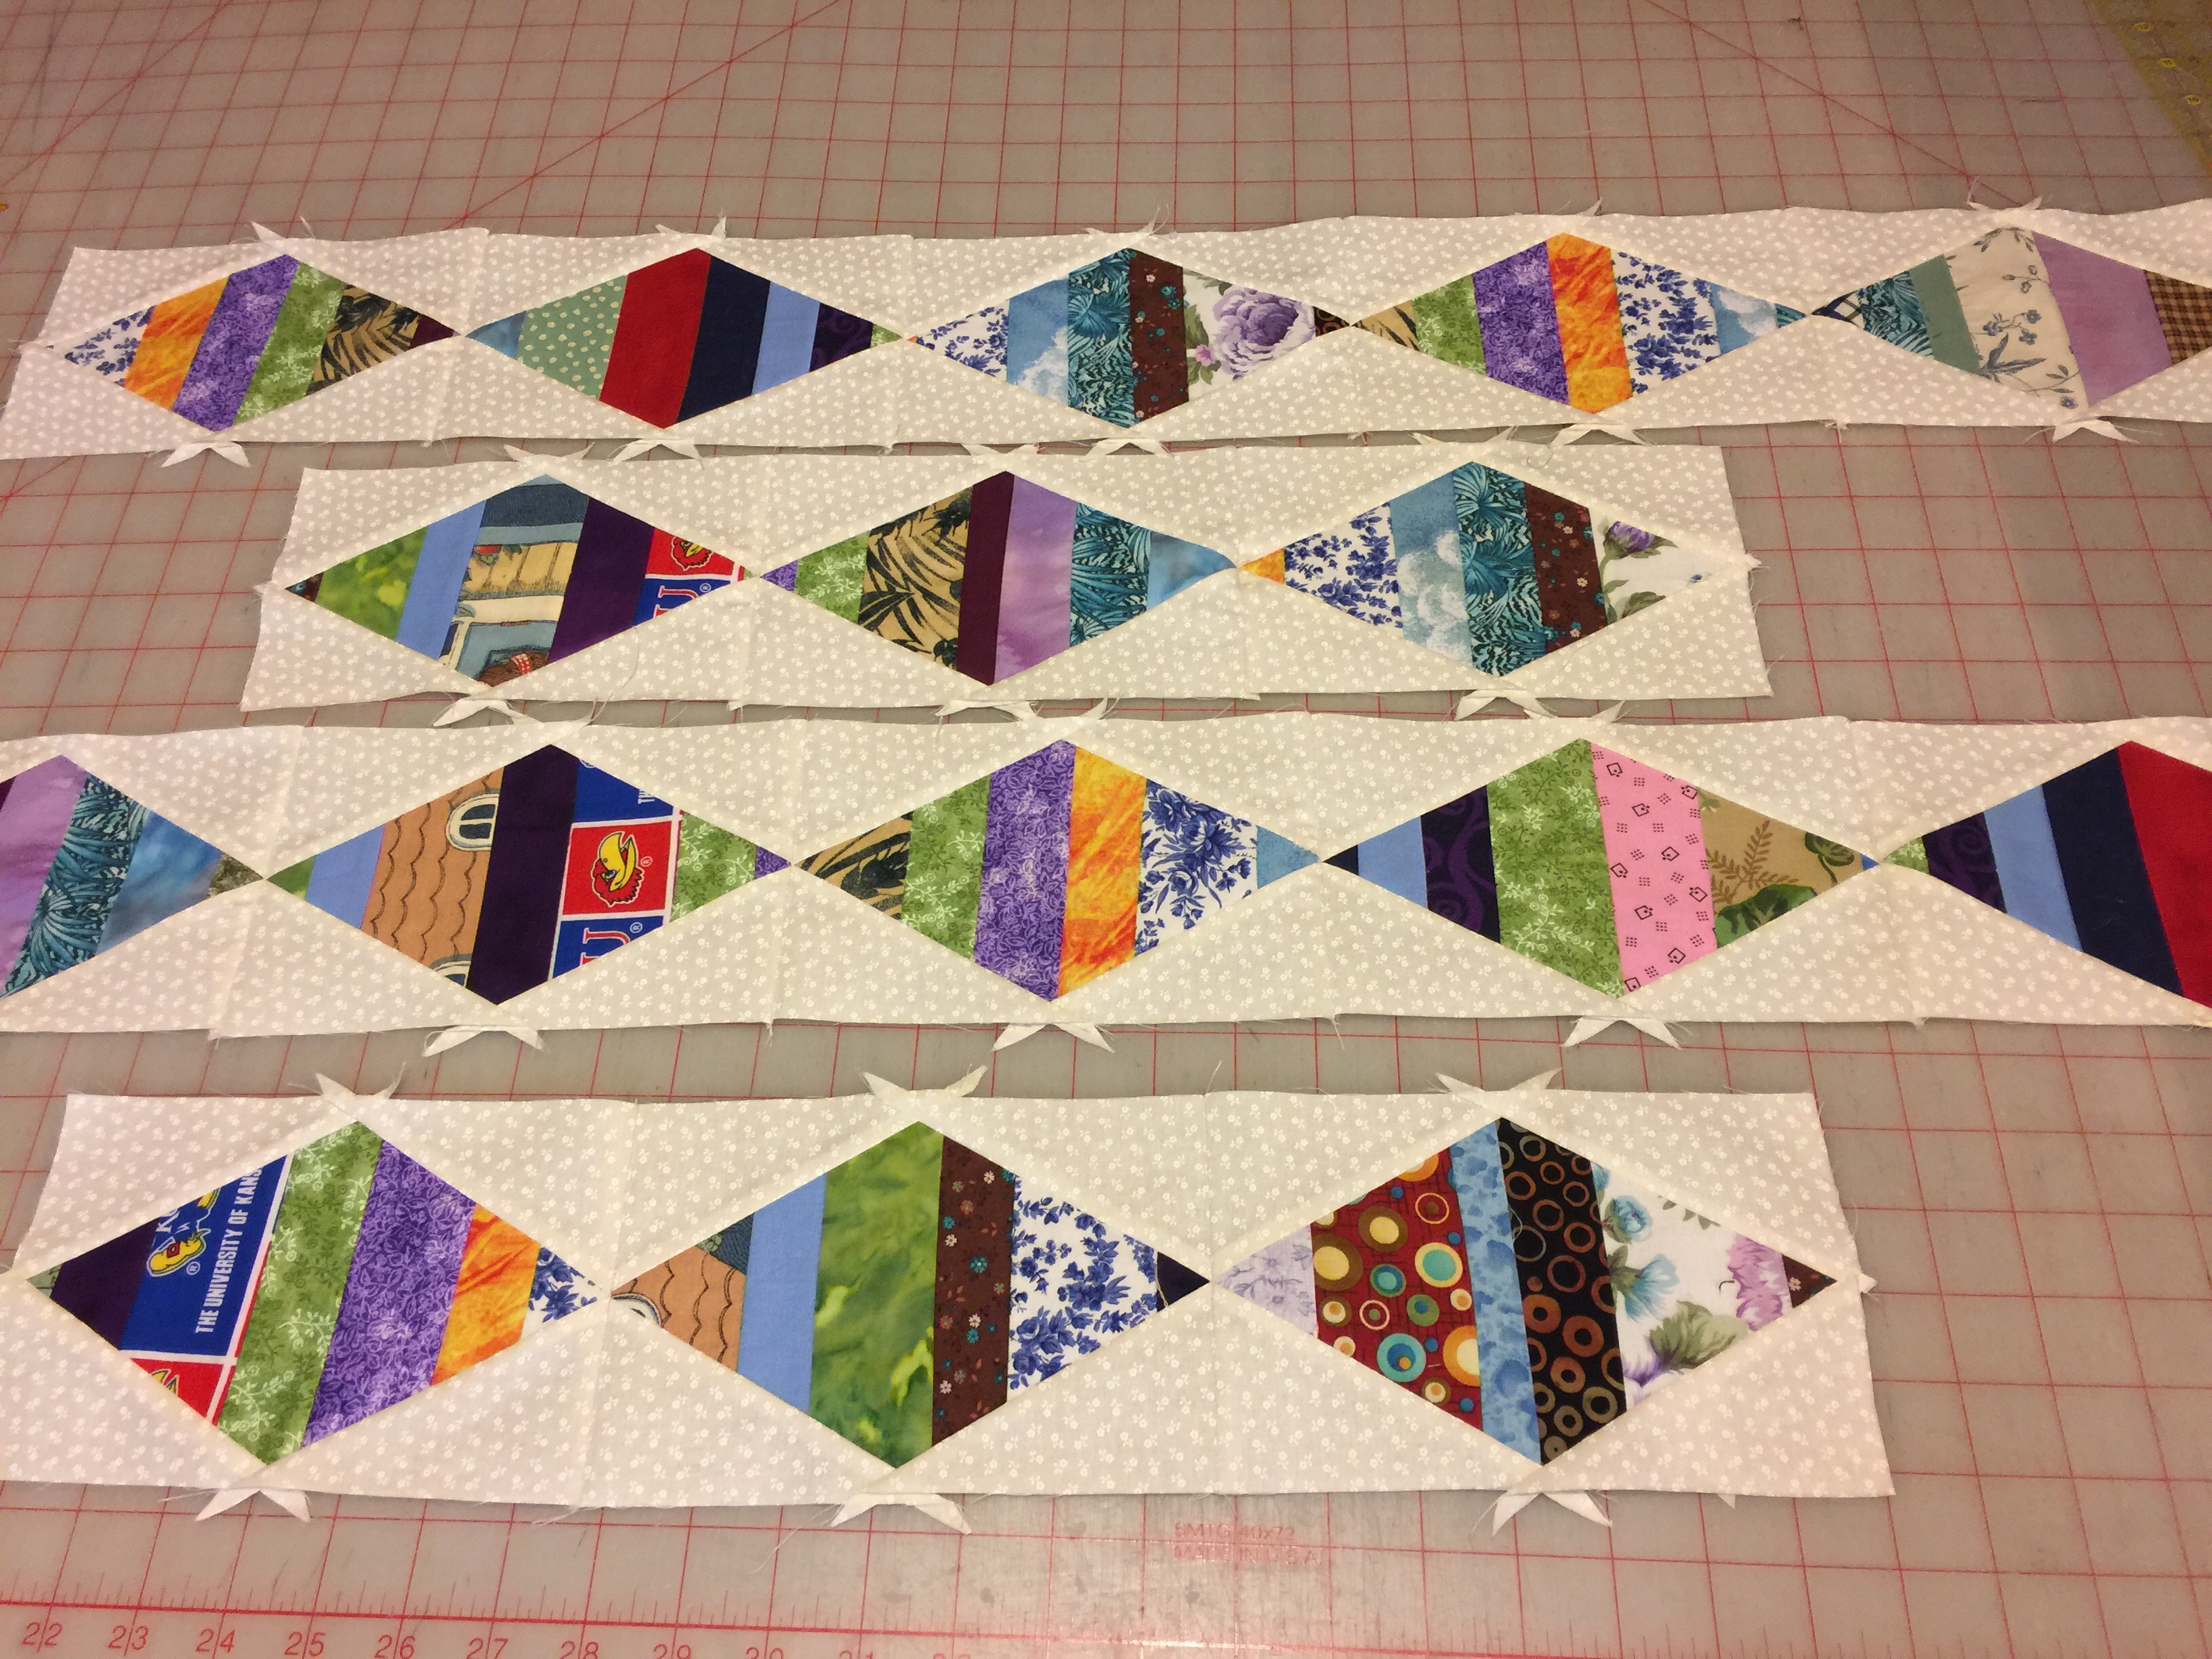 Design wall 10/2/17 string pieced border – Always Quilts : pieced quilt border ideas - Adamdwight.com